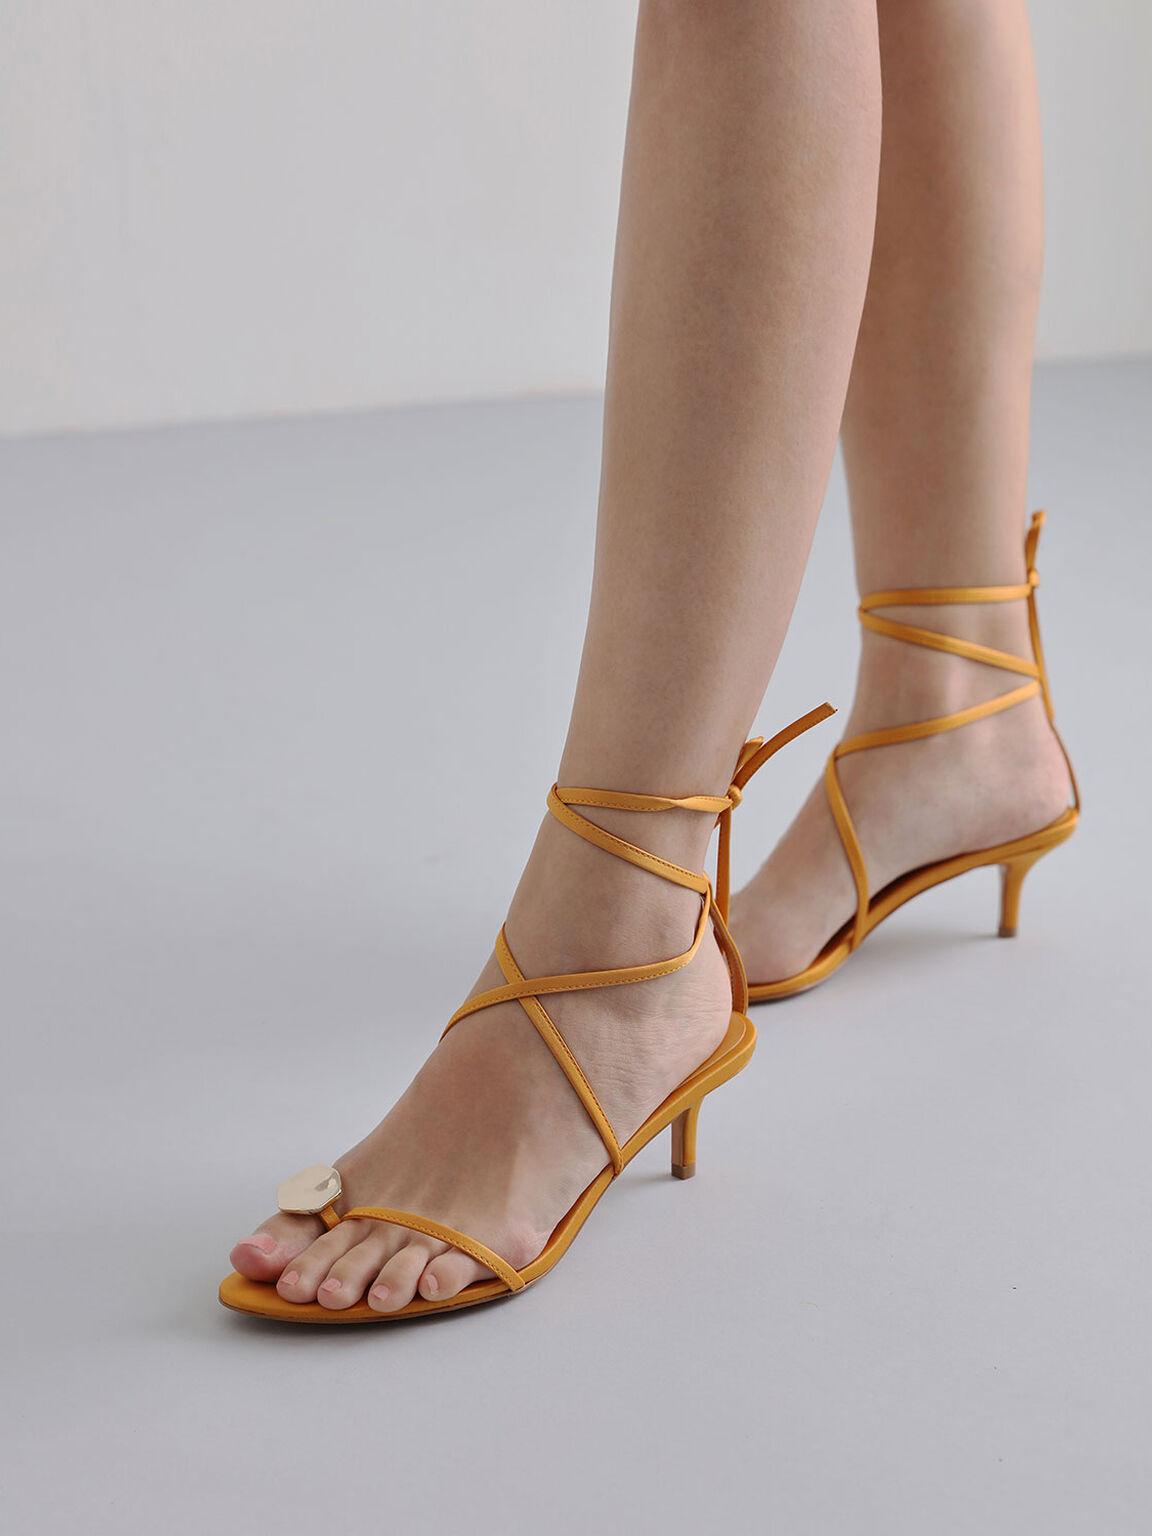 Metal Accent Satin Sandals, Mustard, hi-res